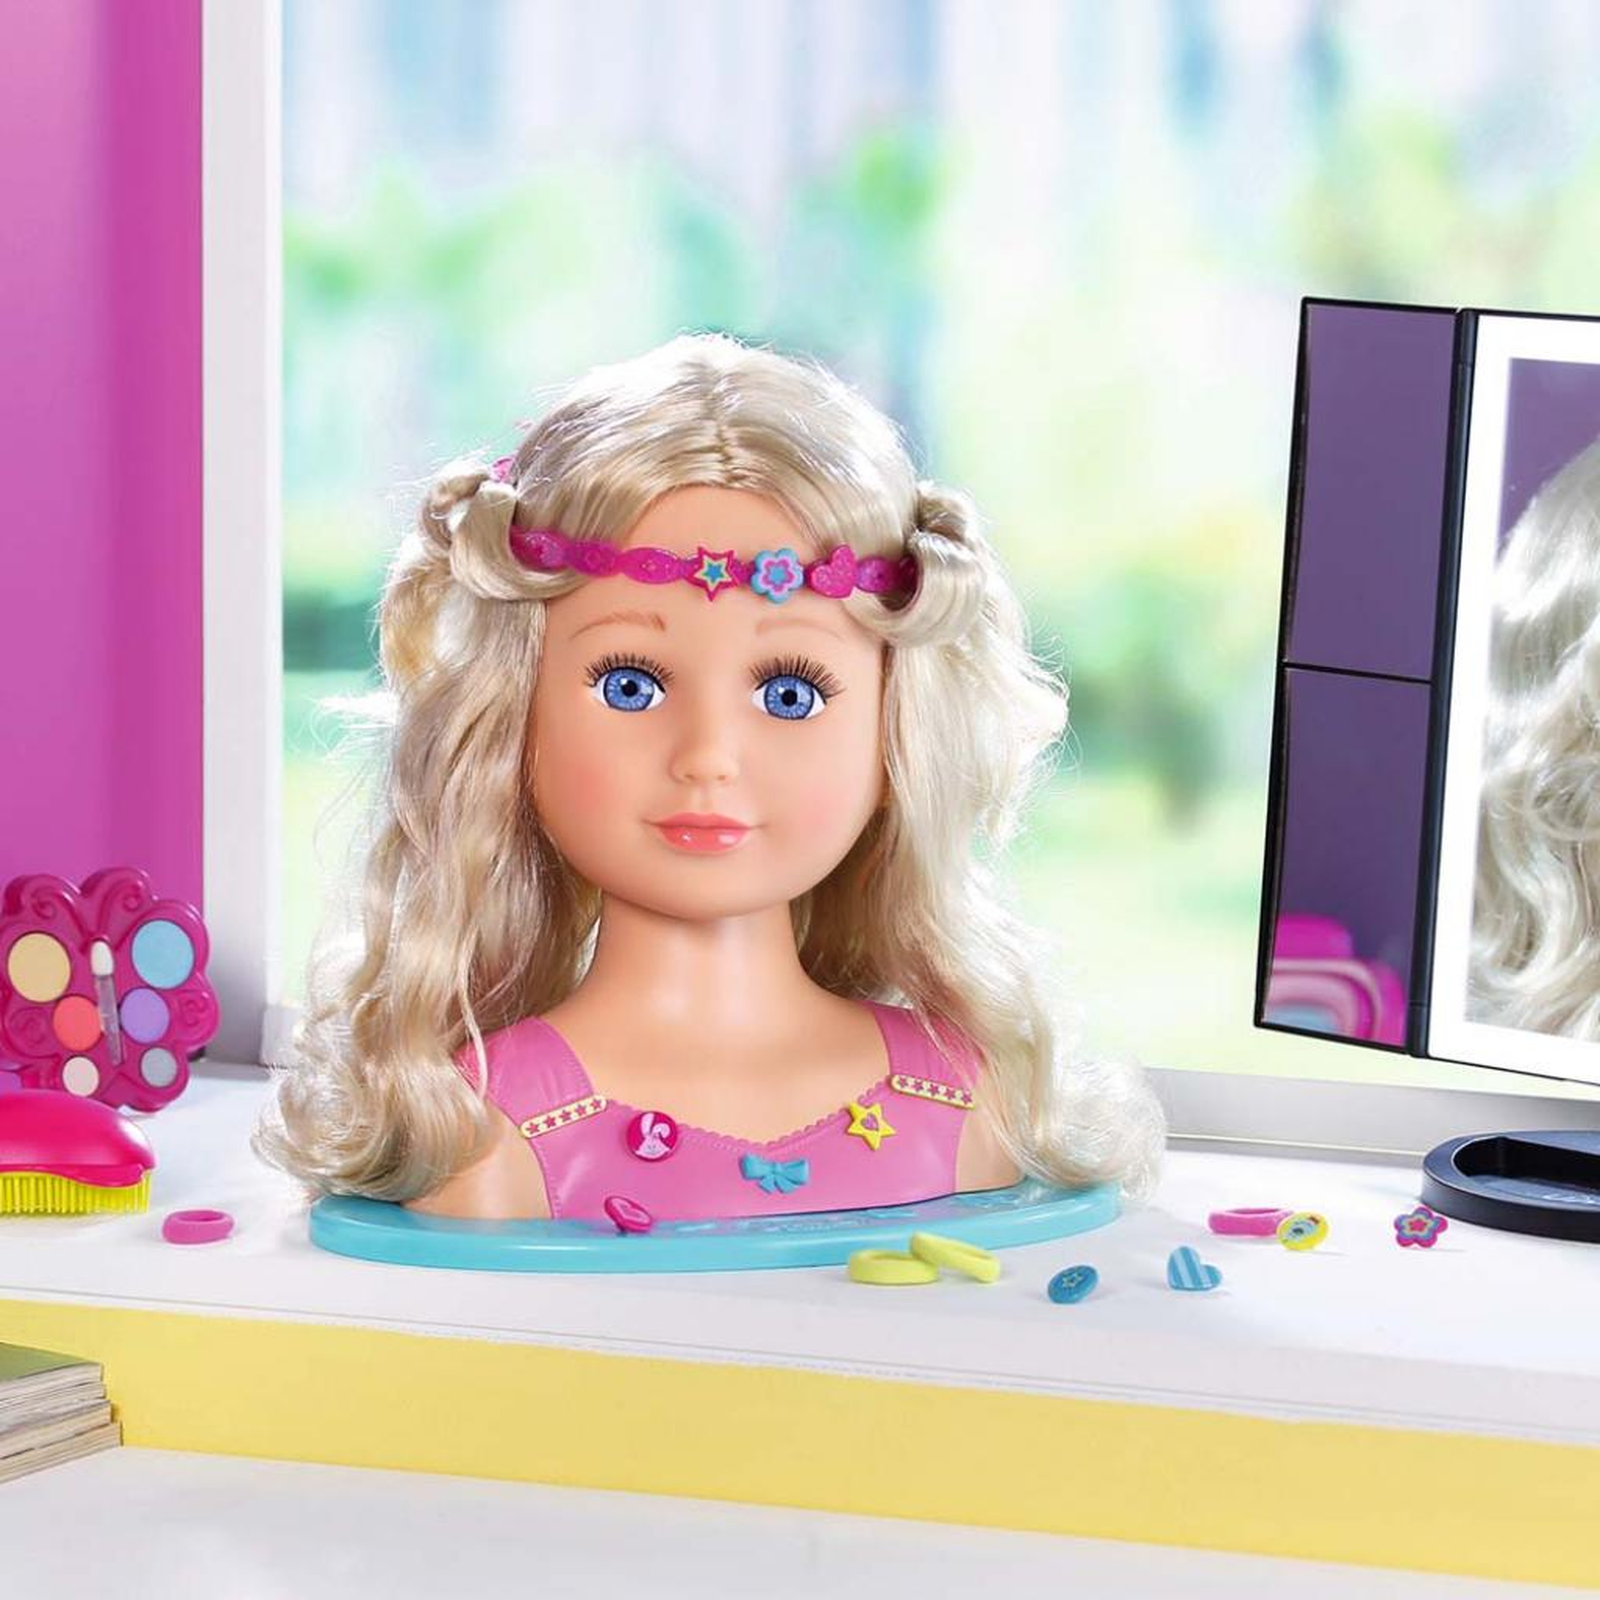 Кукла Zapf манекен My Model Сестричка с аксессуарами (824788) изображение 10